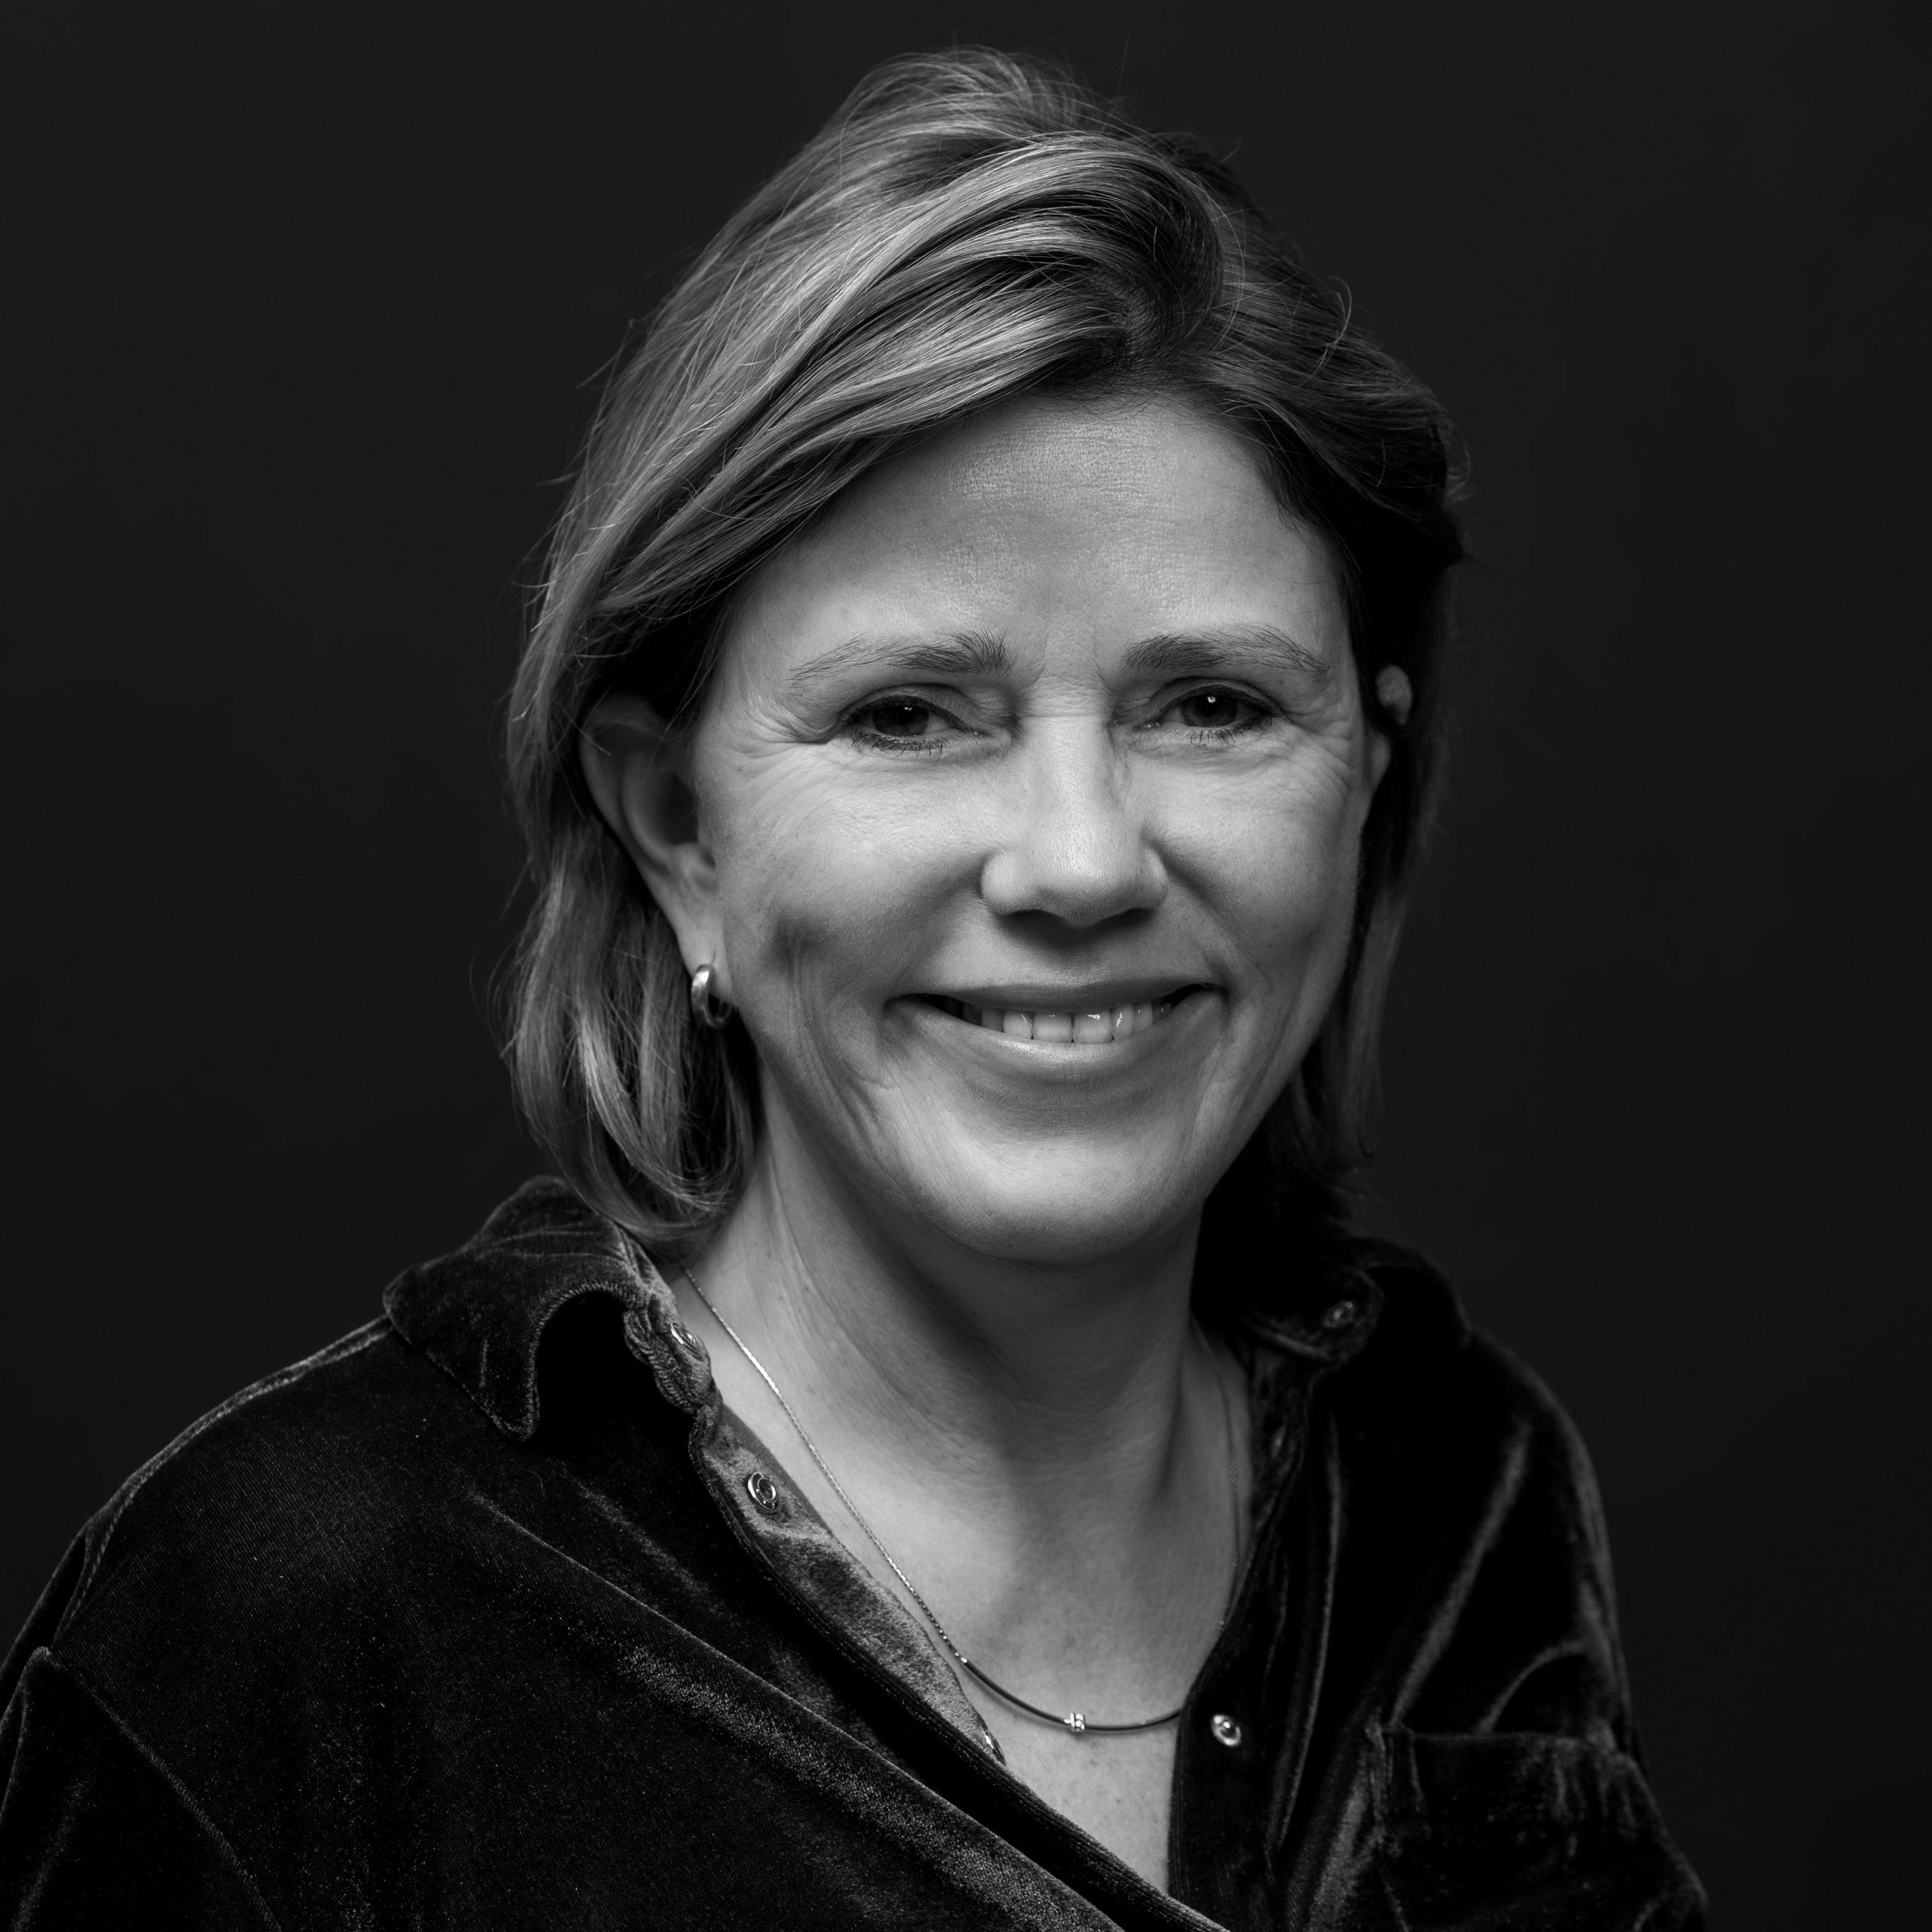 Jocelyne Tophoff